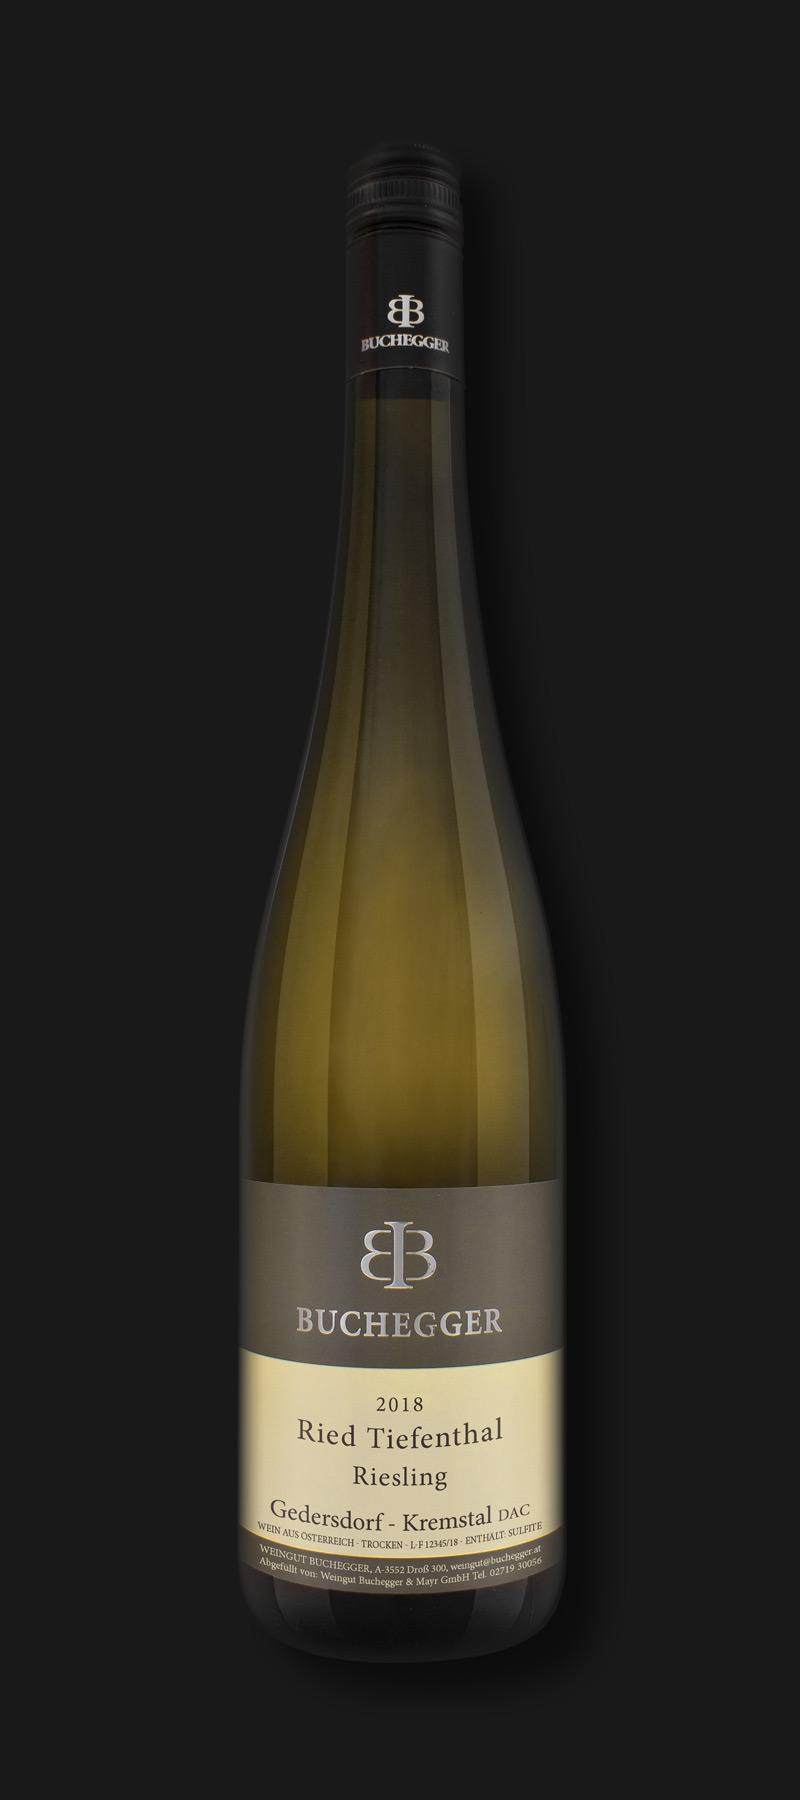 Weingut Buchegger Riesling Tiefenthal 2018